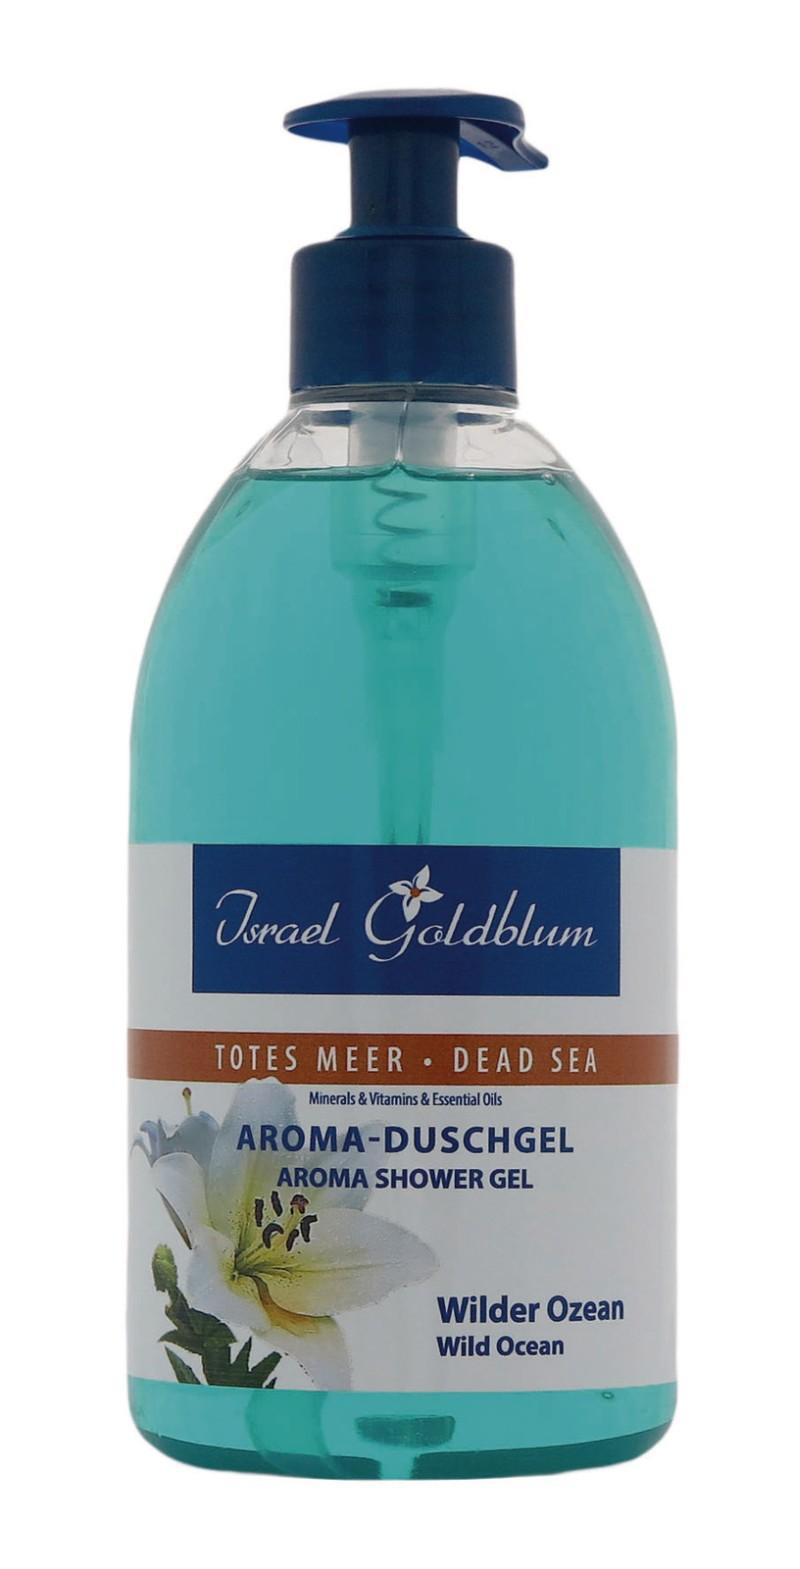 Aroma-Duschgel - Wilder Ozean